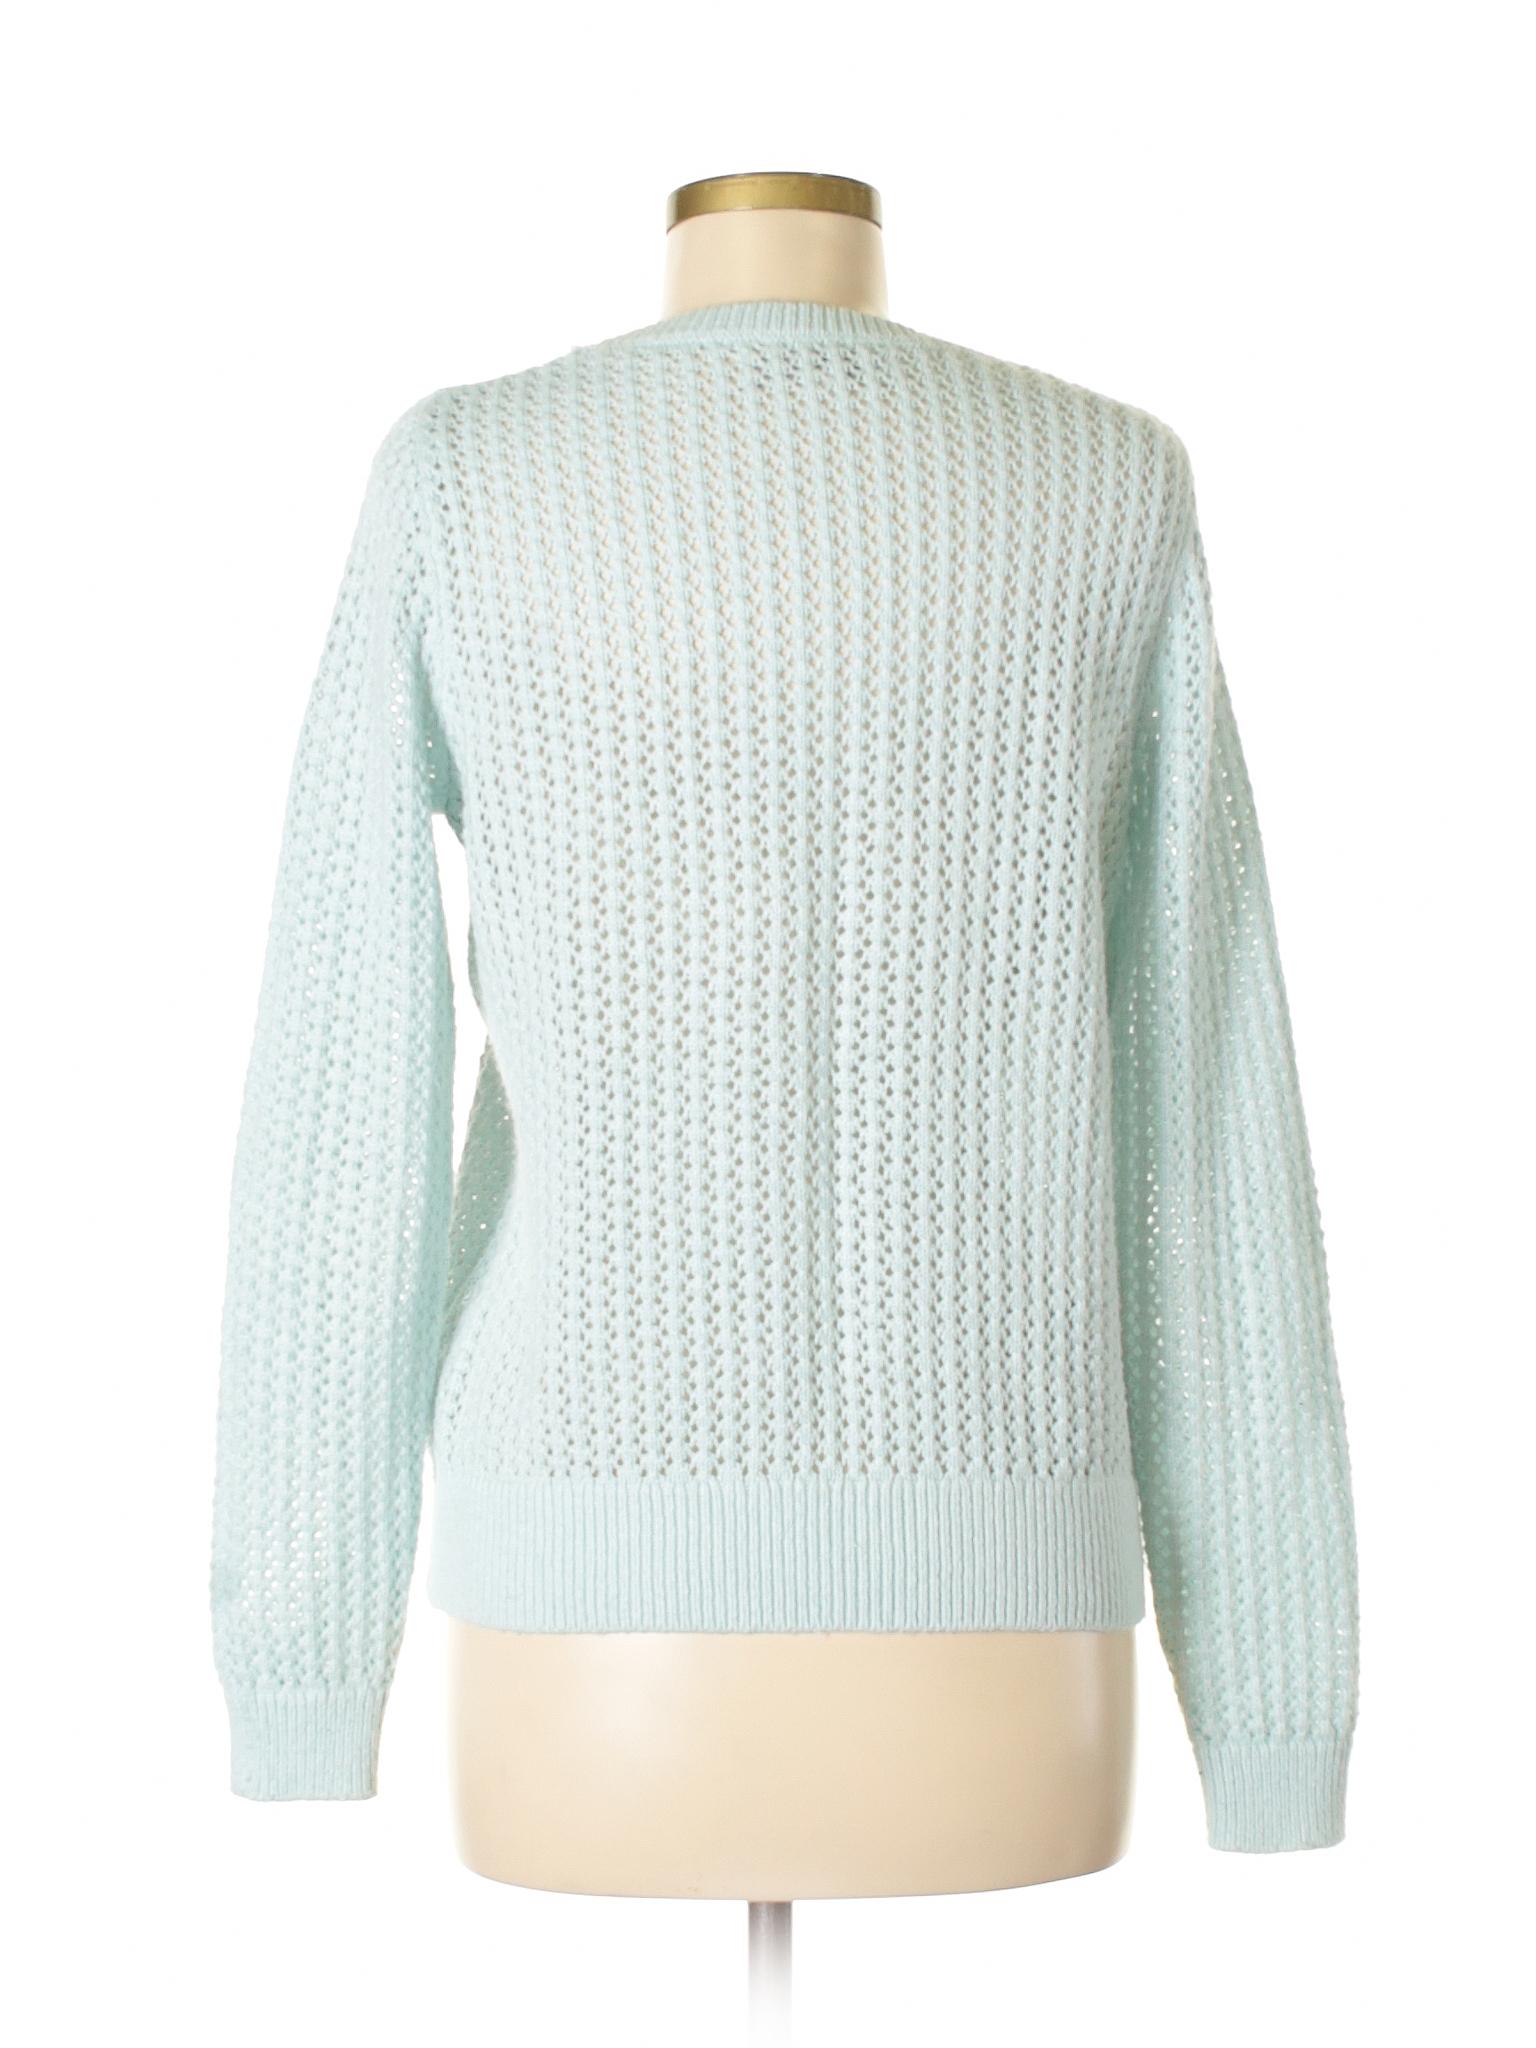 Taylor Sweater winter Pullover LOFT Ann Boutique xvwBnqSpw